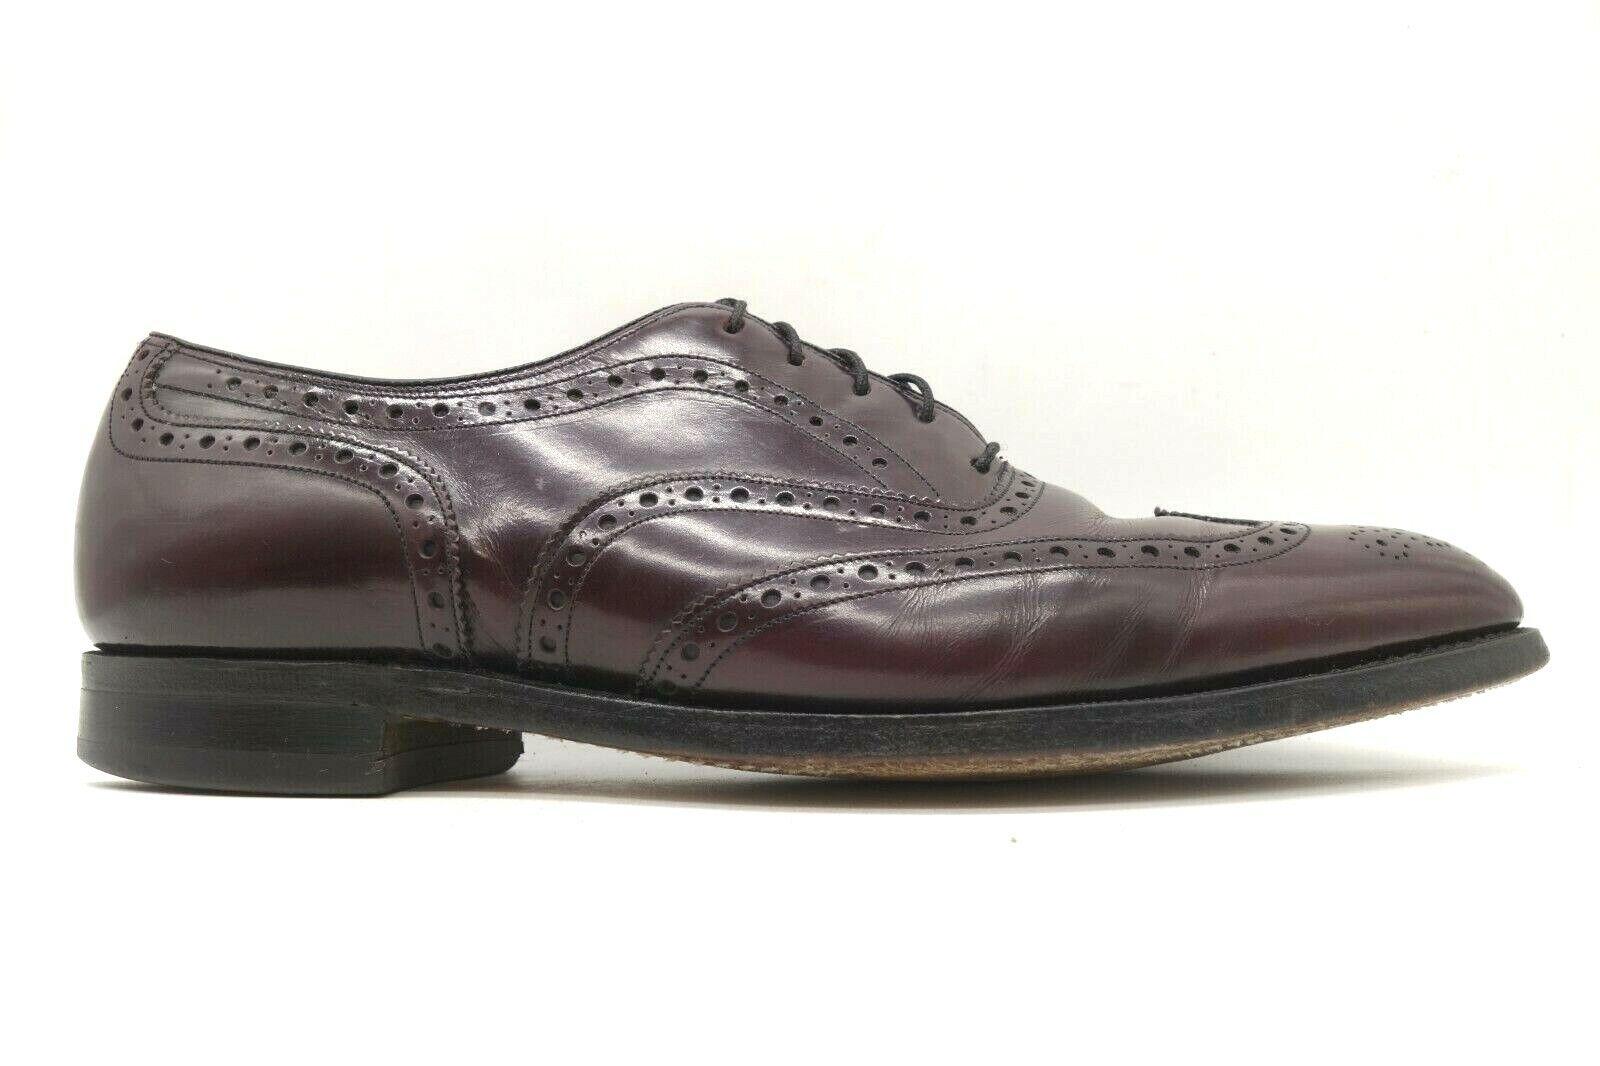 Johnston Murphy Aristocraft USA Burgundy Wingtip Oxfords Shoes Men's 10.5 C